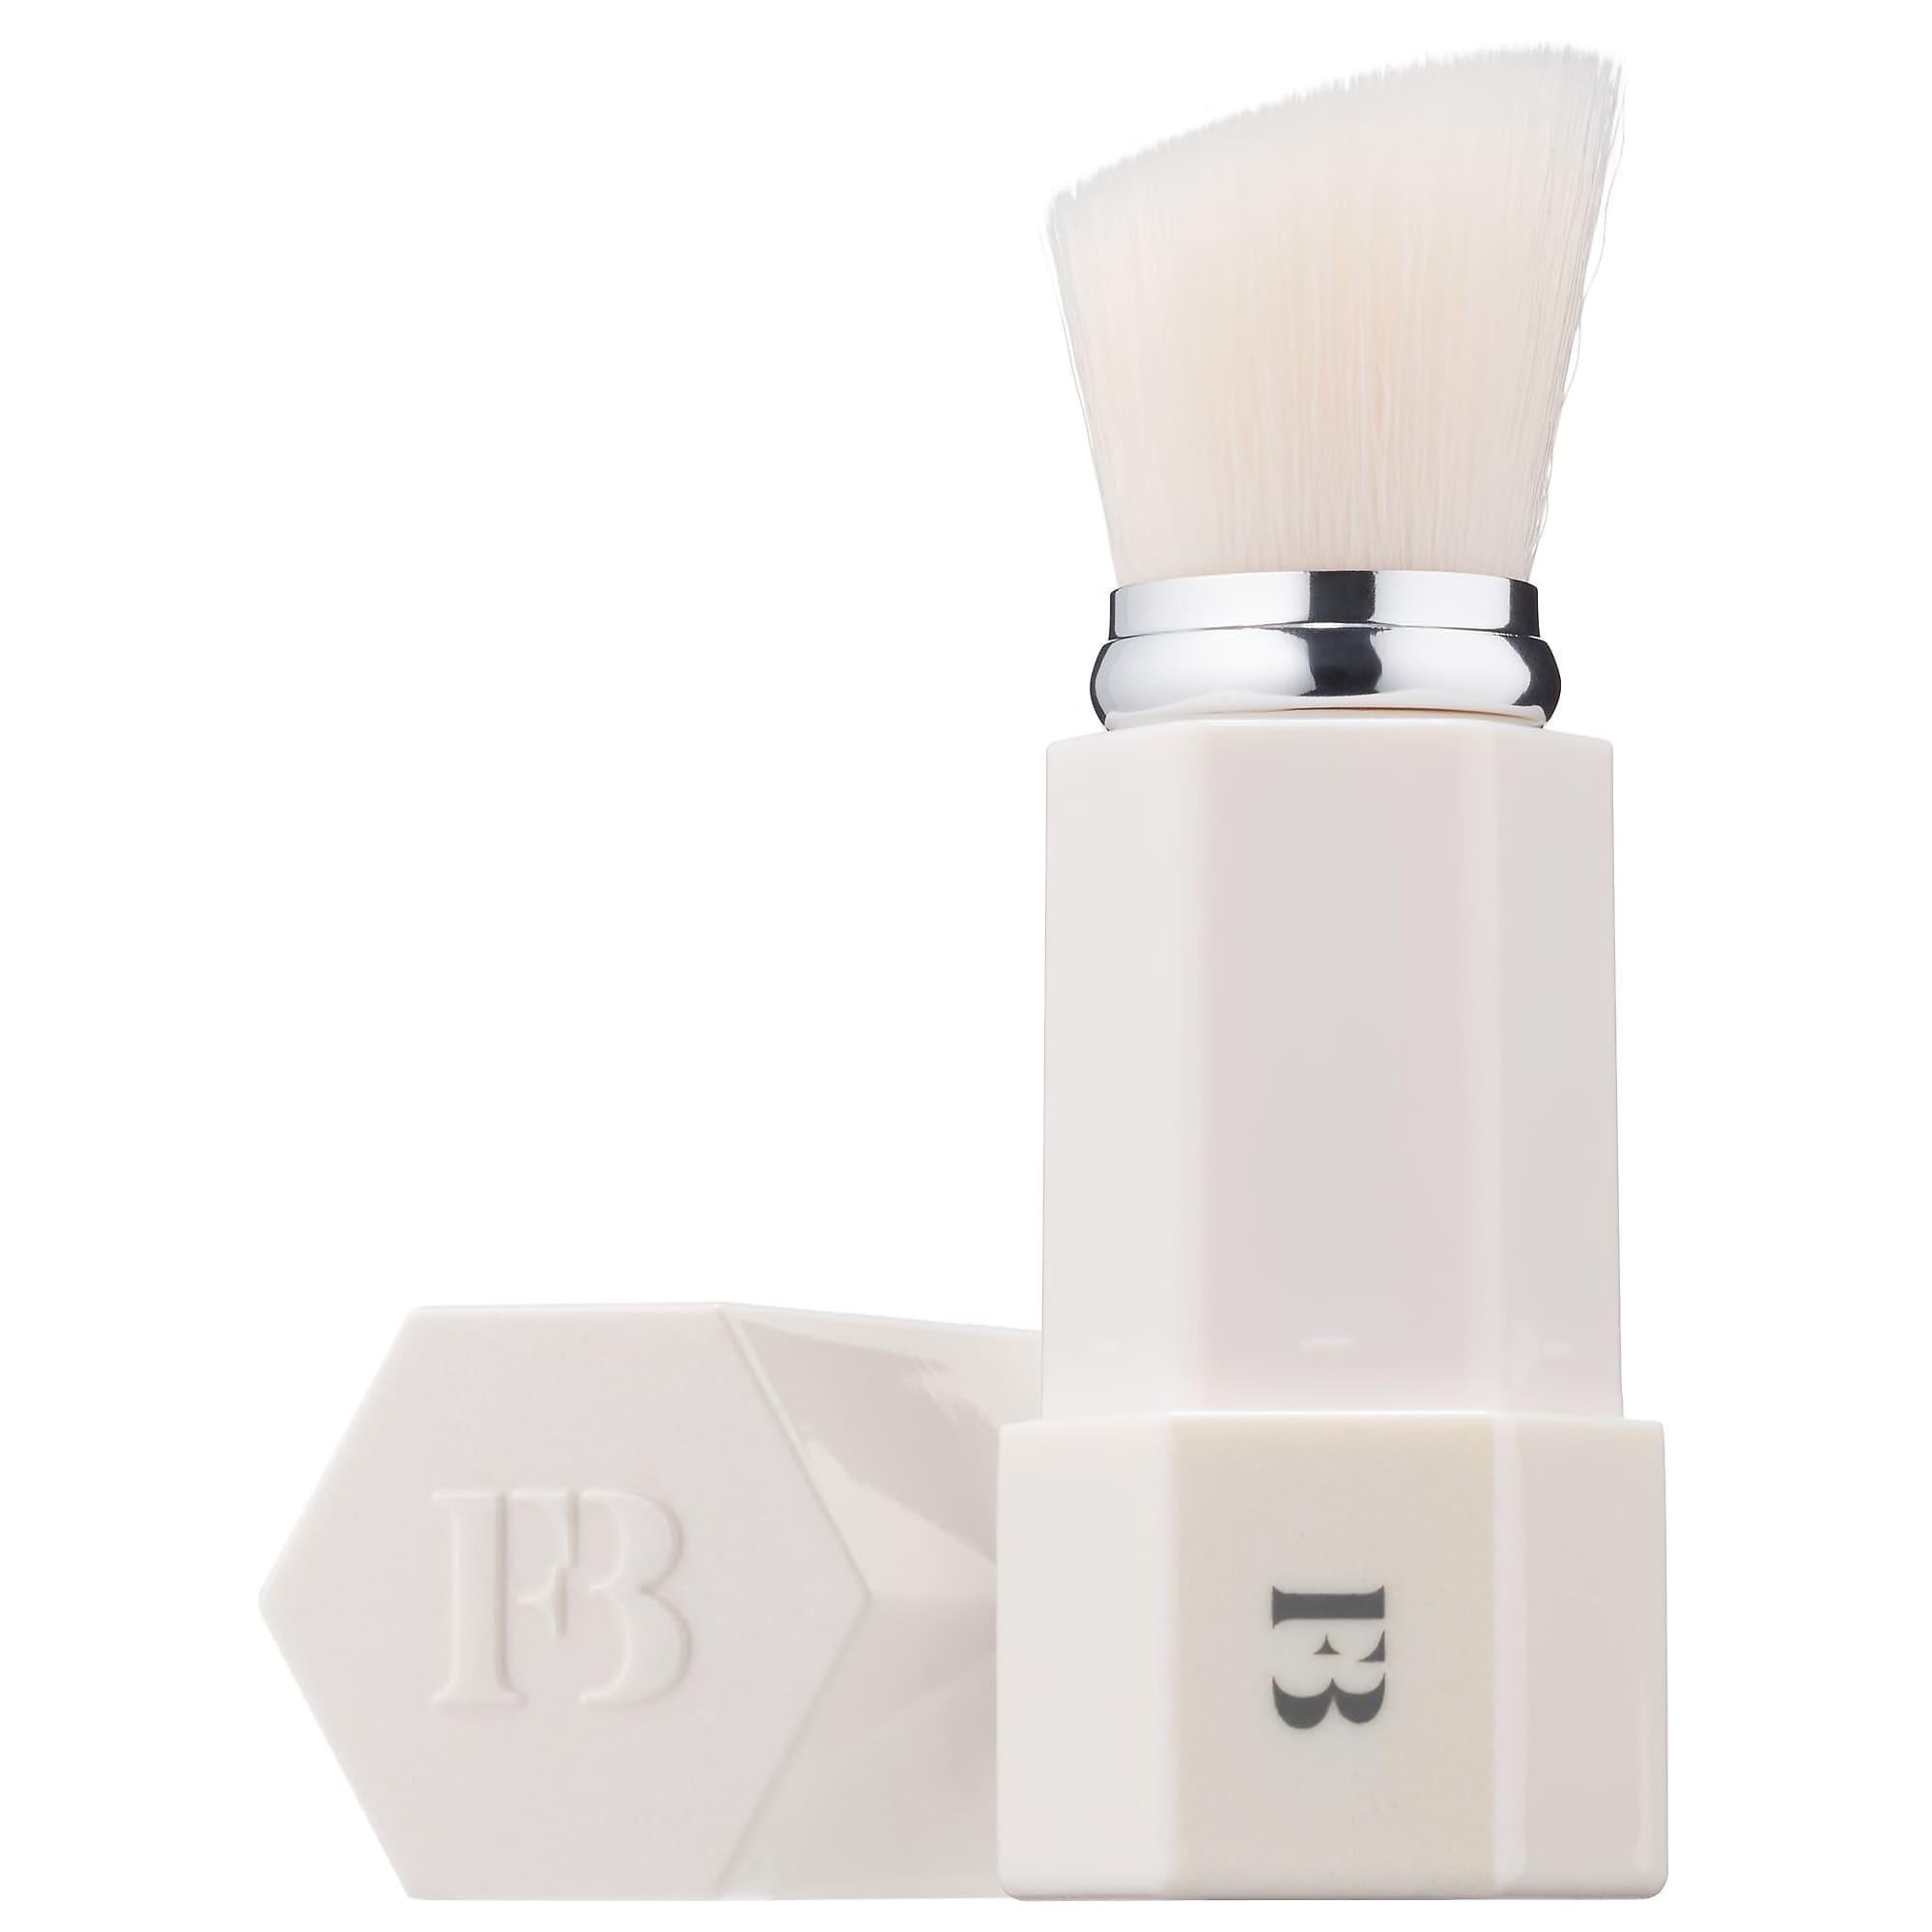 Fenty Beauty Portable Touchup Brush 130